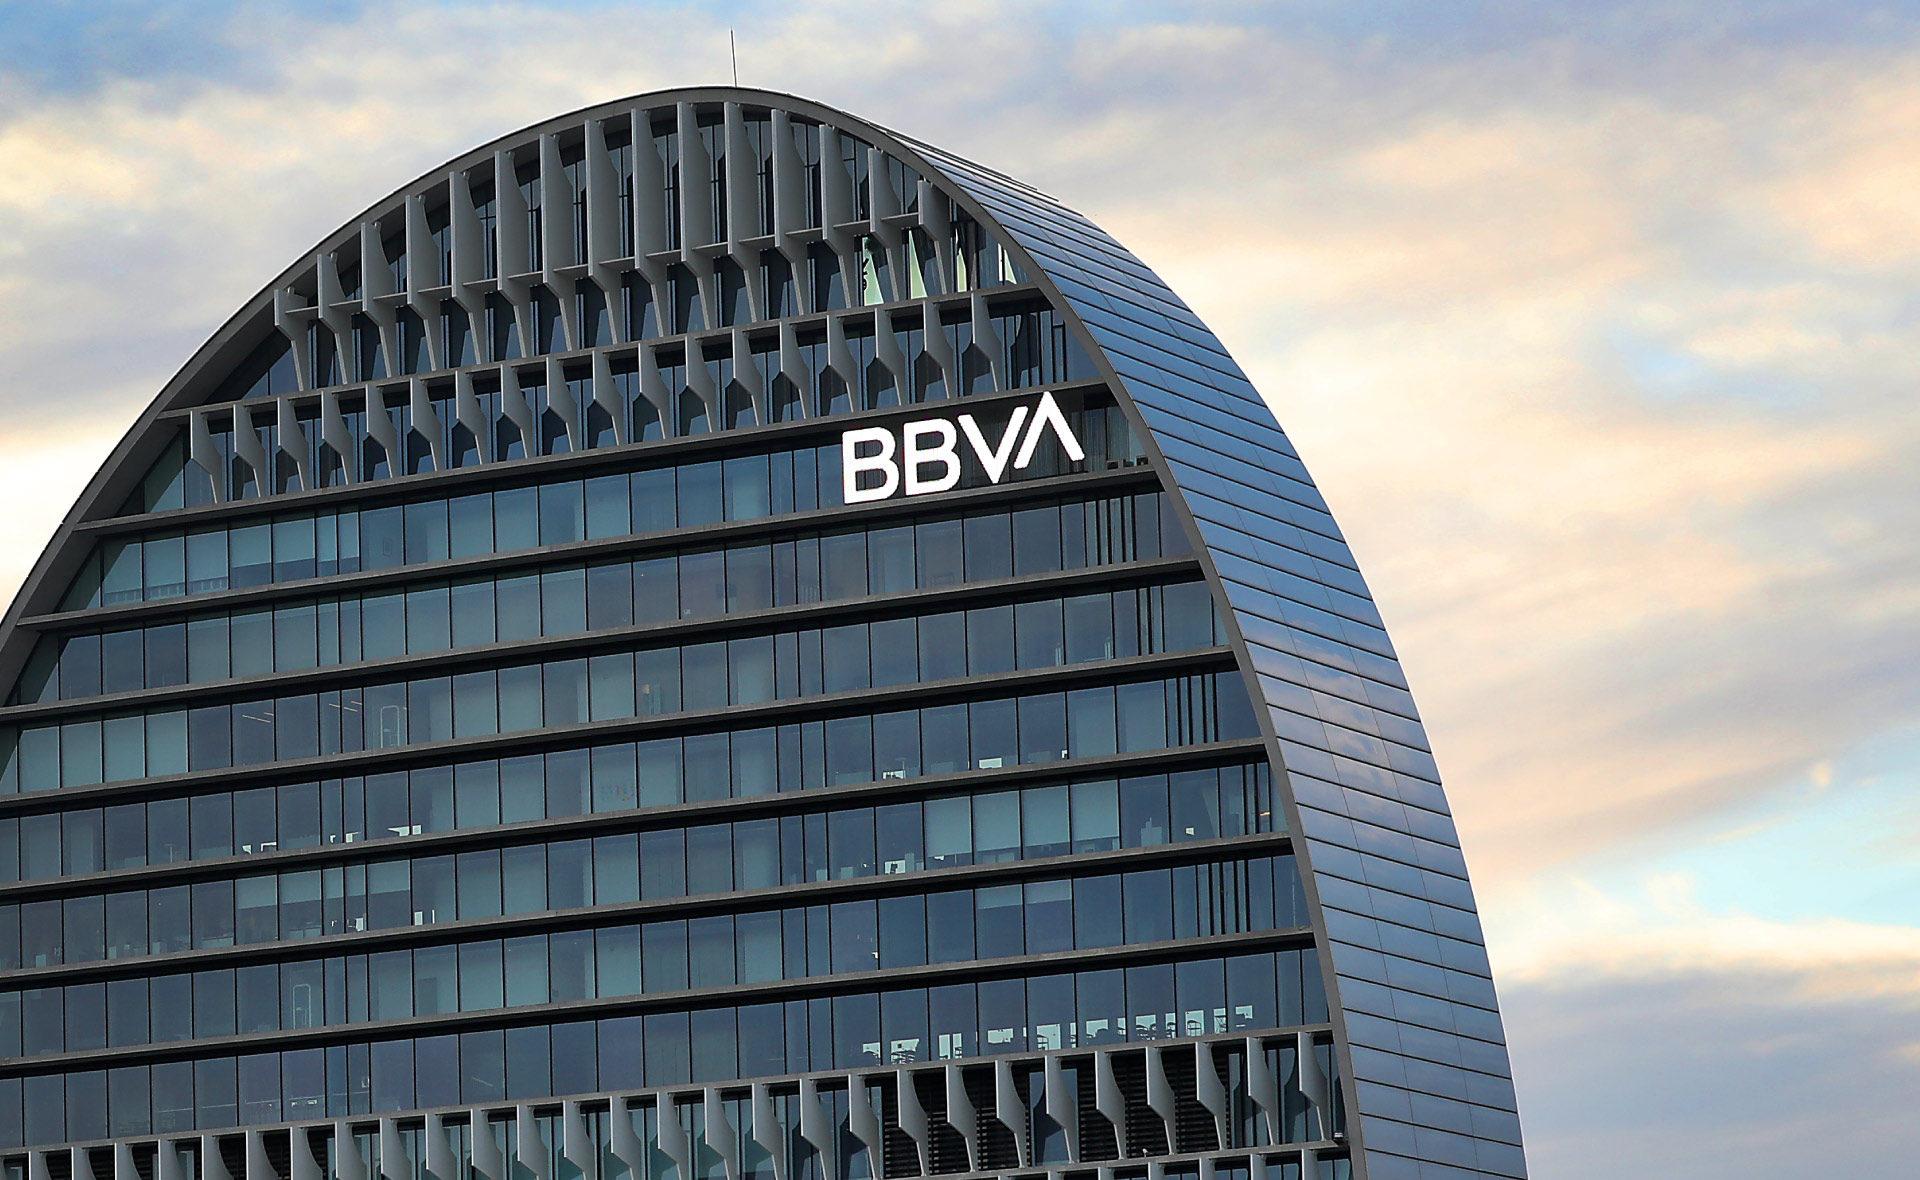 https://shareholdersandinvestors.bbva.com/wp-content/uploads/2020/04/La-Vela-imagen-ciudad-1920x1180.jpg